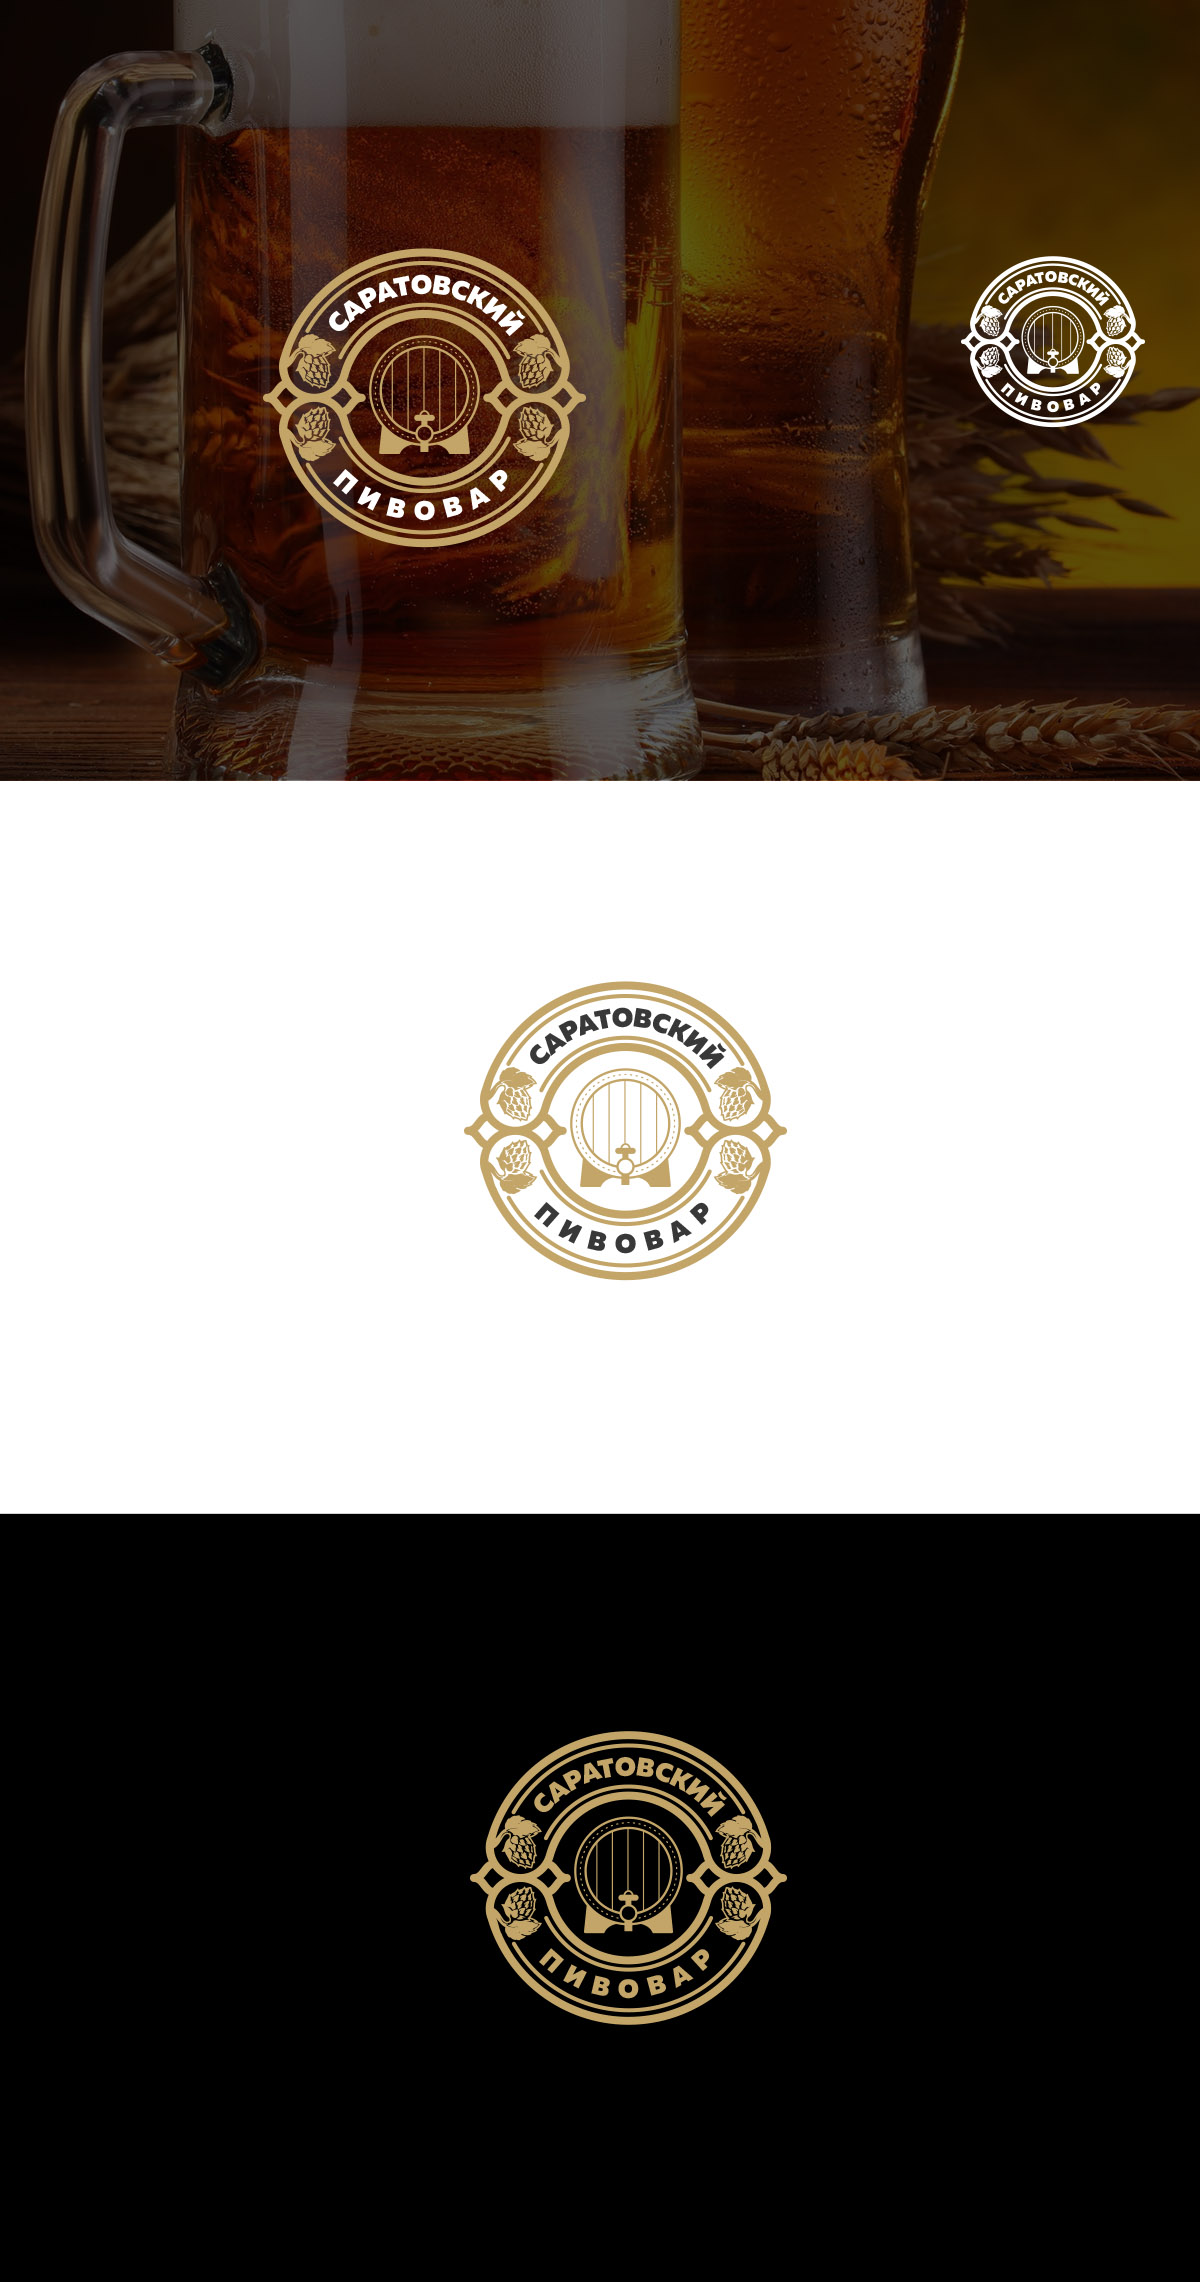 Разработка логотипа для частной пивоварни фото f_3035d7c12fc91043.jpg